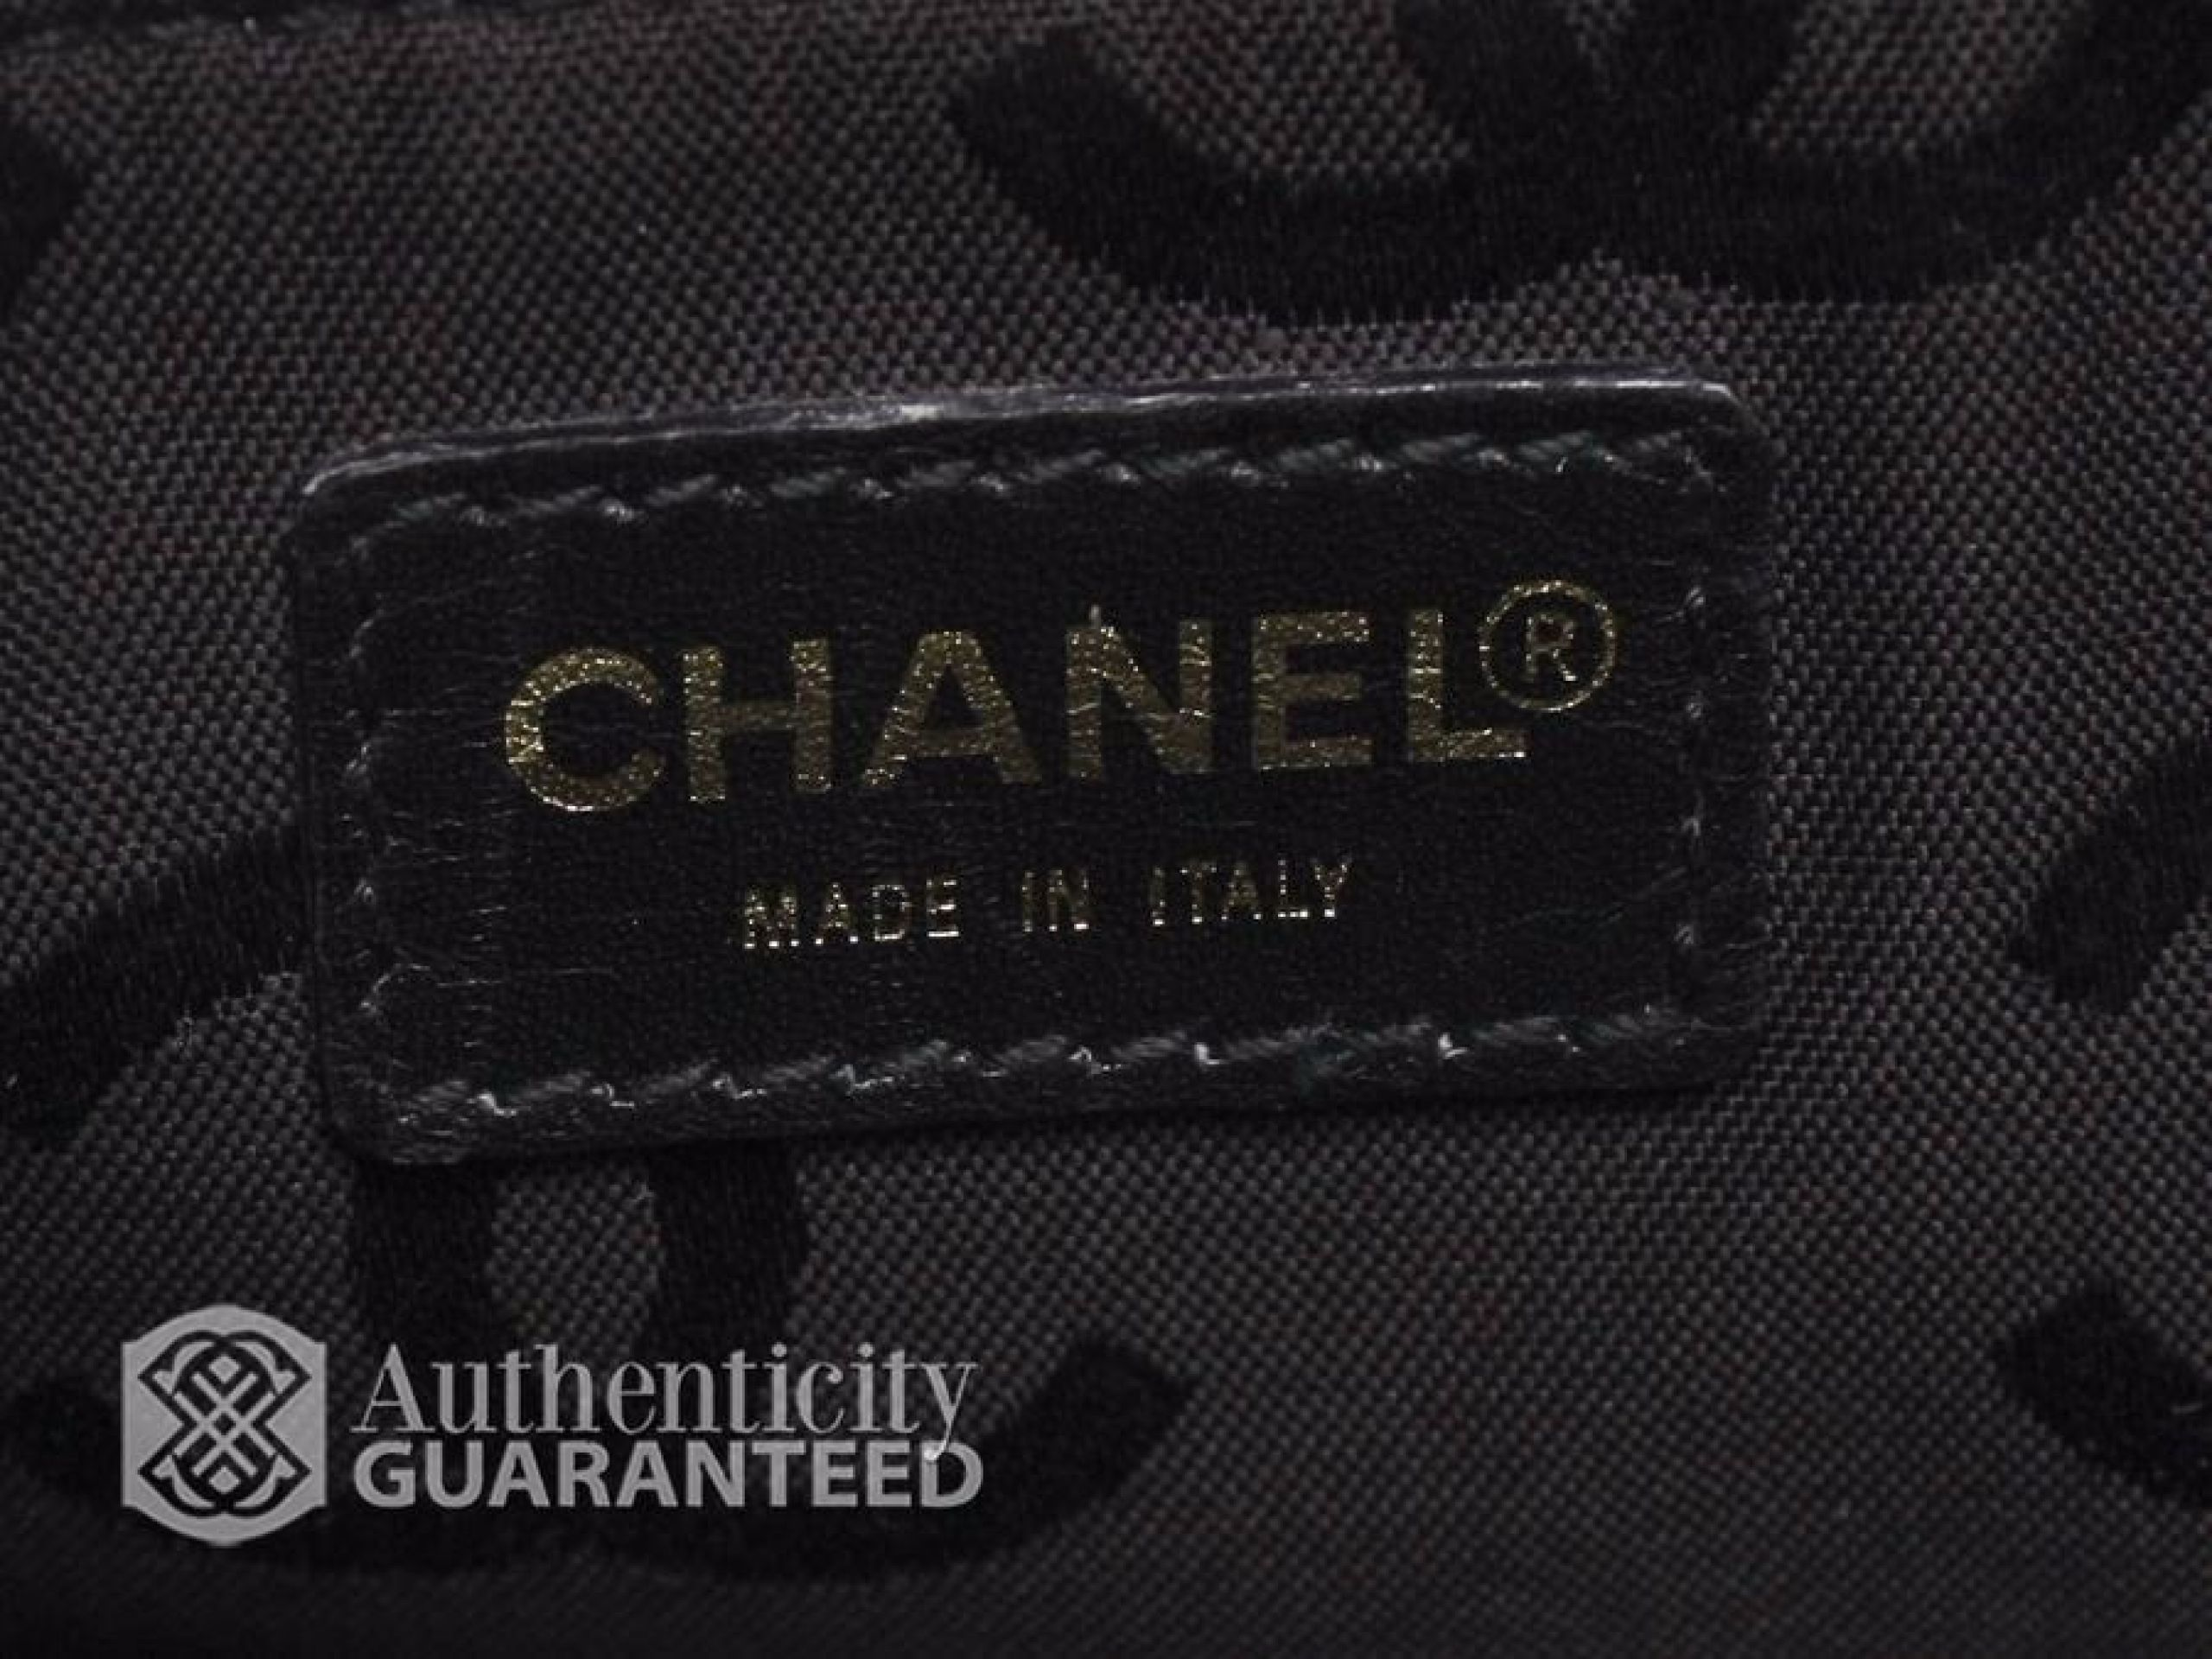 Chanel Black Leather Large Surpique Work Tote Bag